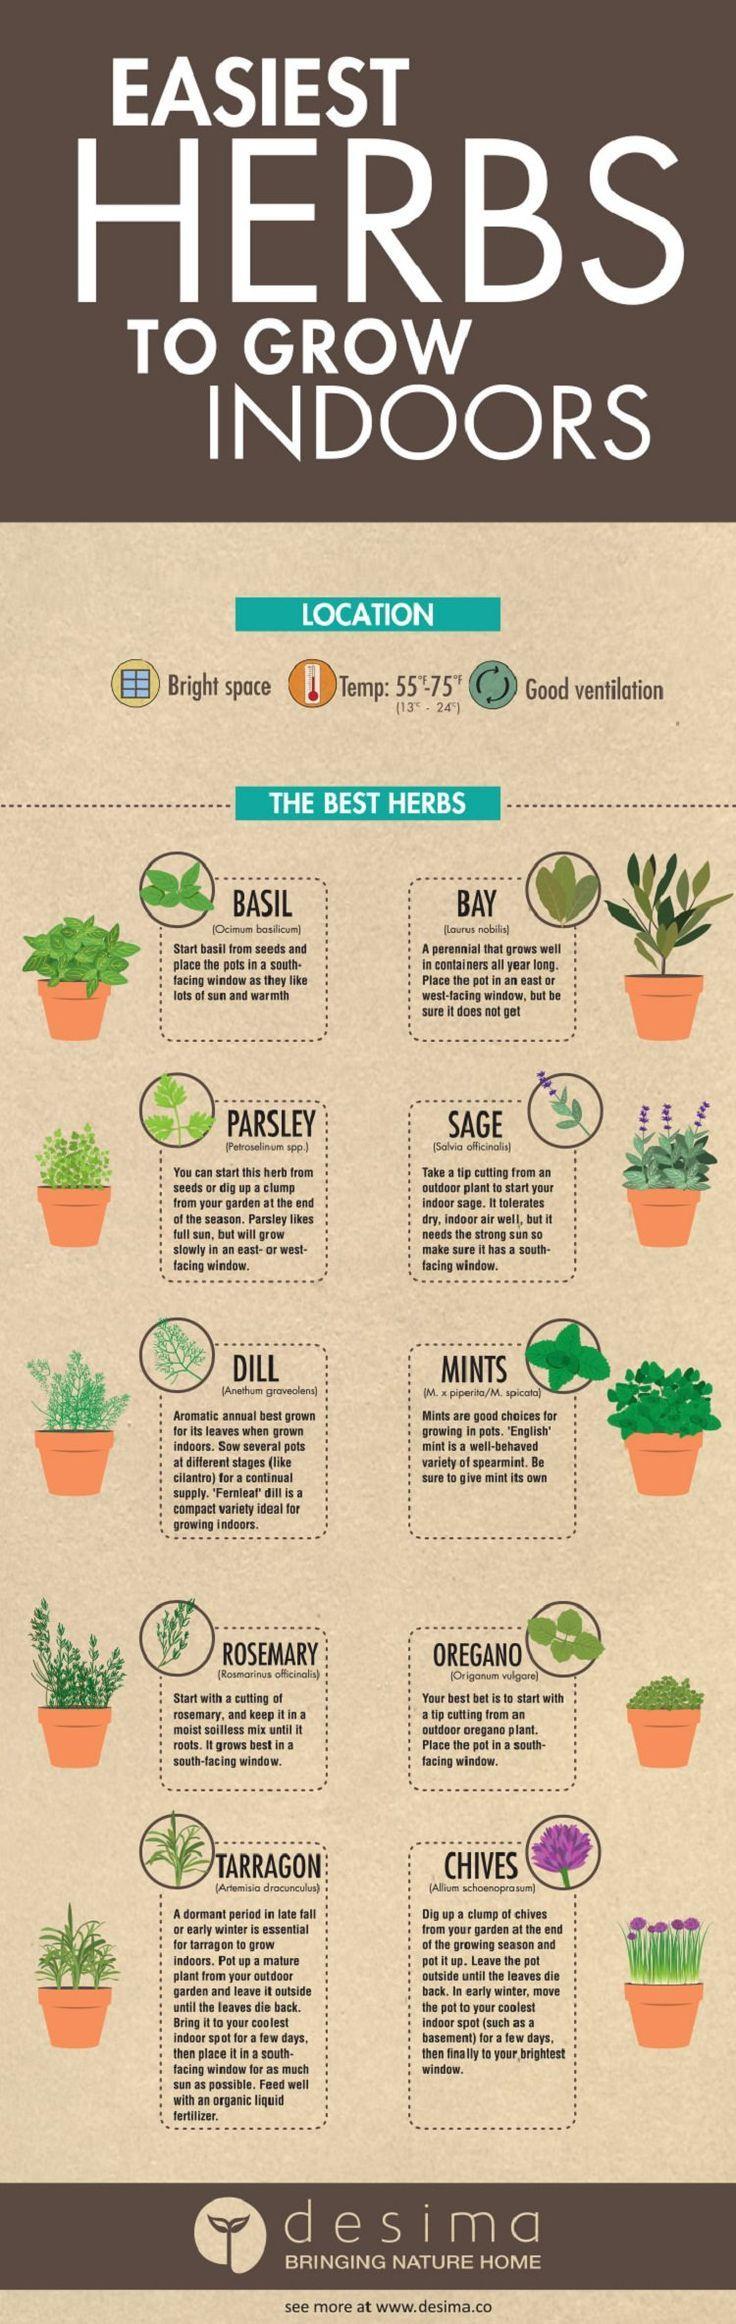 2492 Best Frugal Living Images On Pinterest Gardening Tips Outdoor Gardens And Vegetables Garden